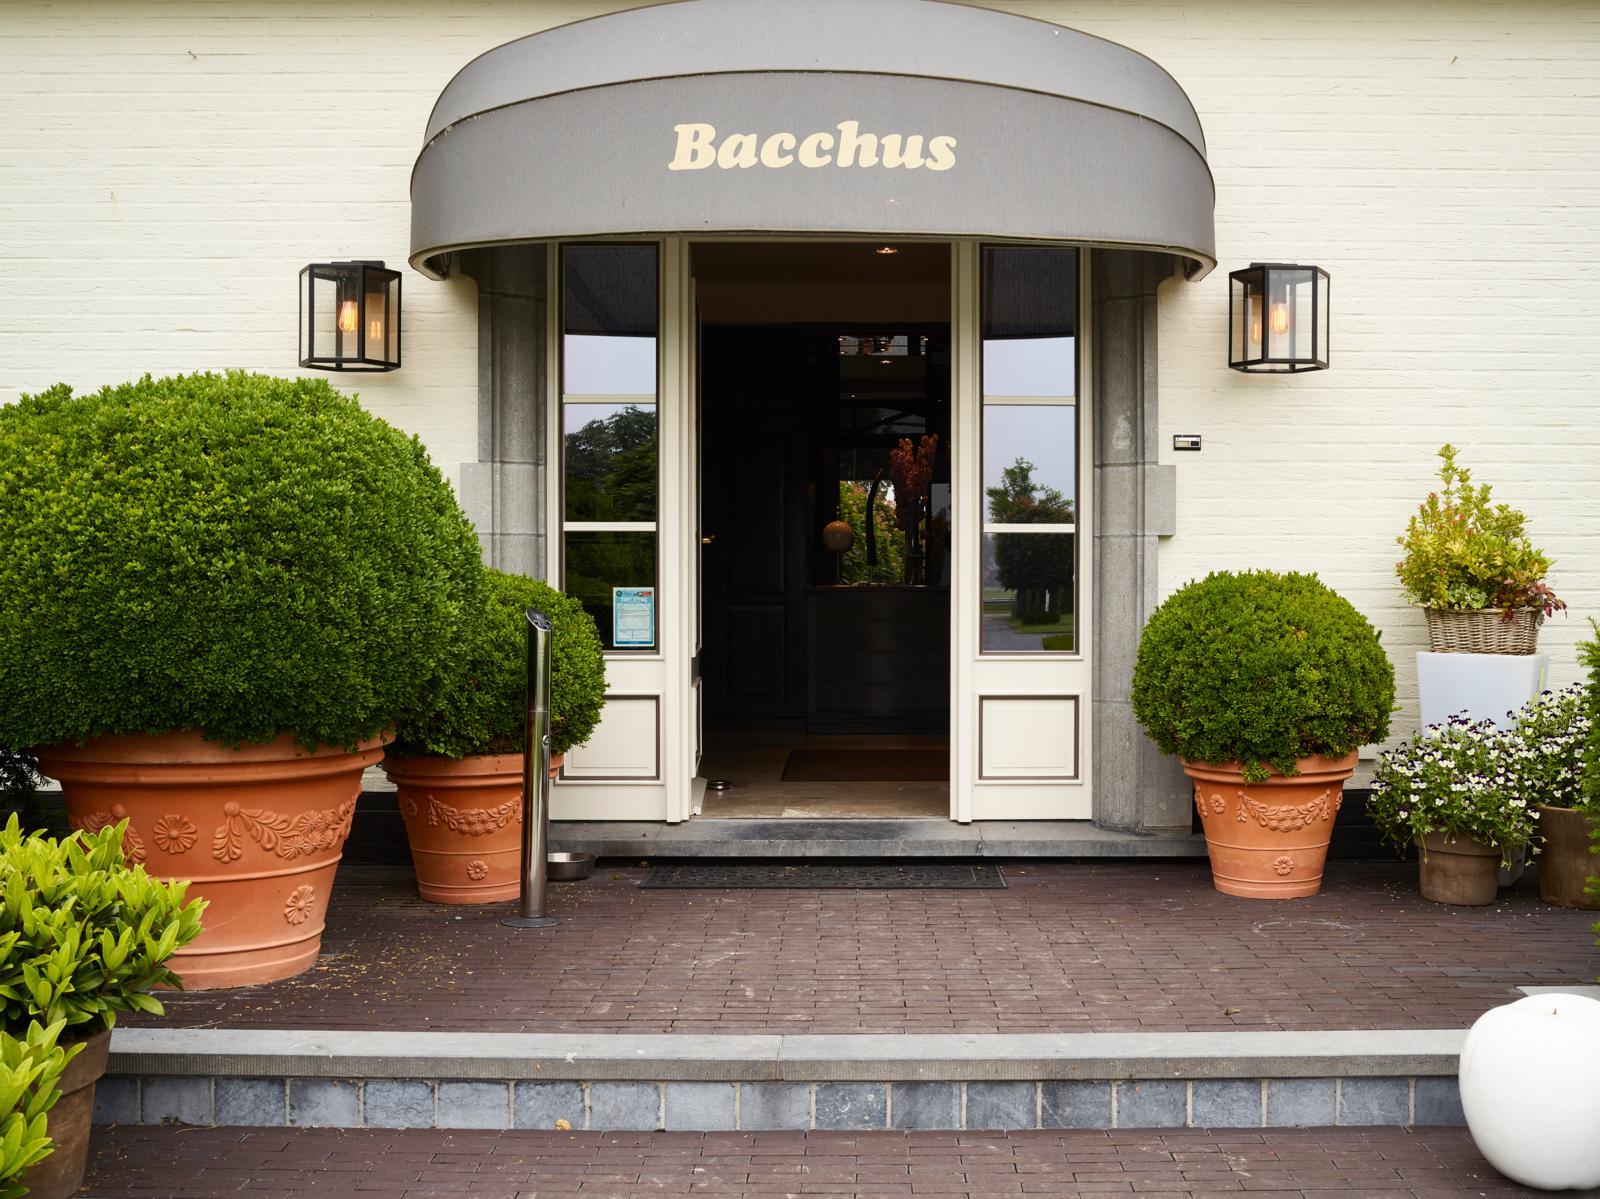 Restaurant Bacchus